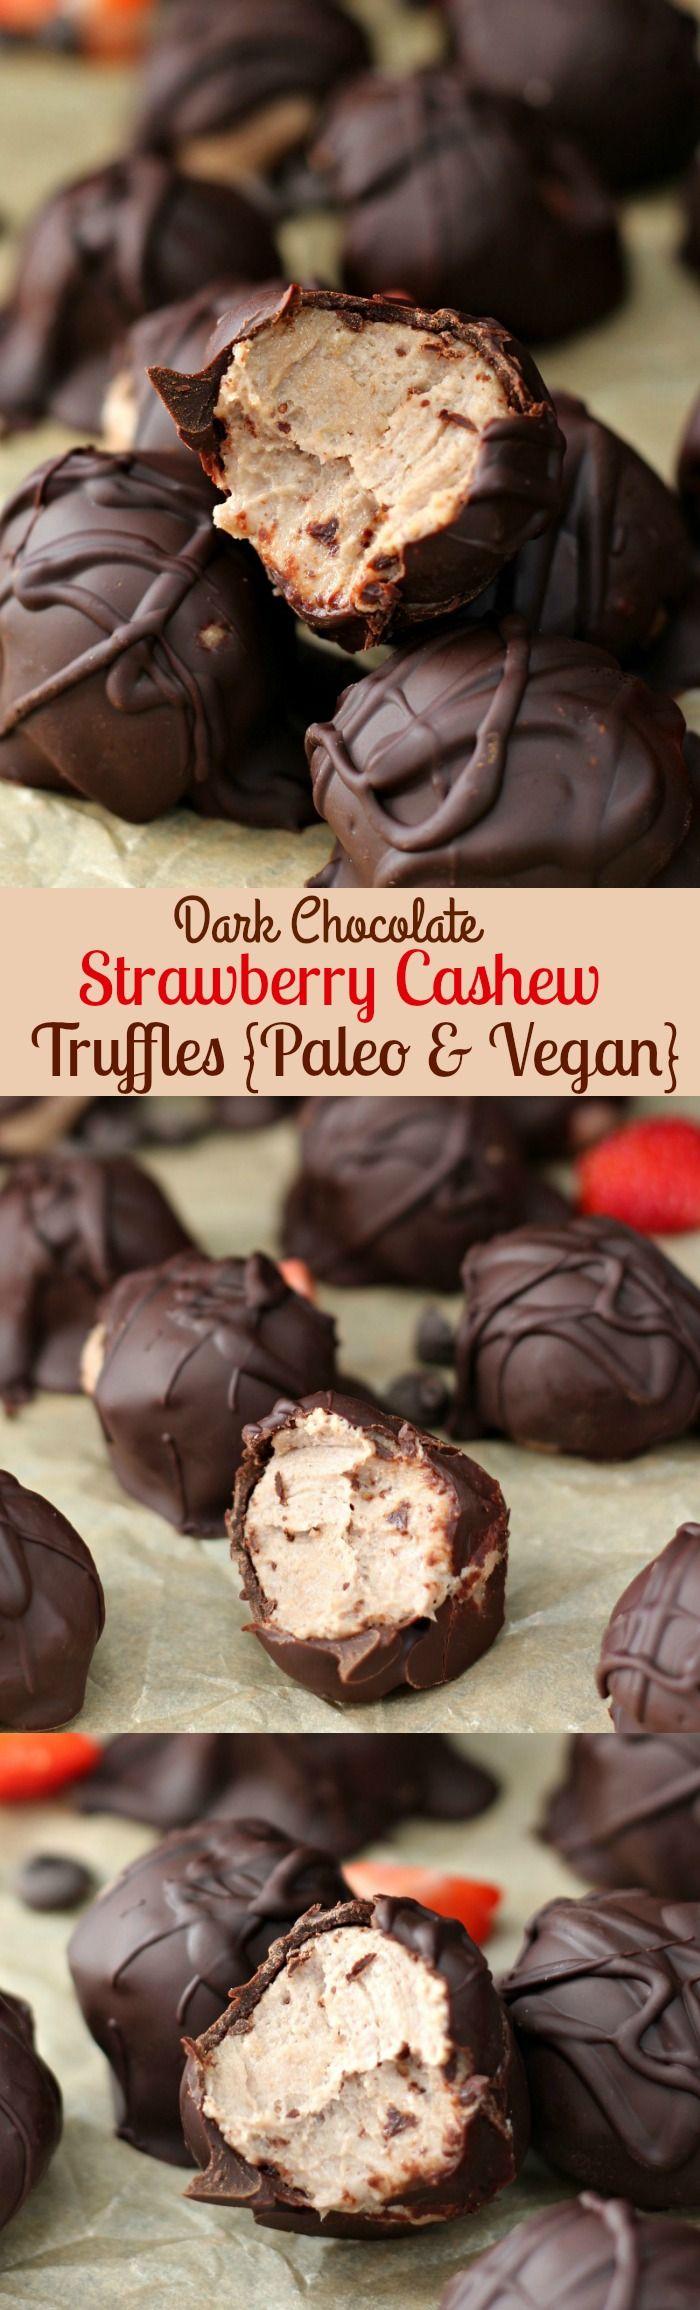 Dark Chocolate Strawberry Cashew Truffles {Paleo & Vegan} no bake, gluten free, healthy and decadent!